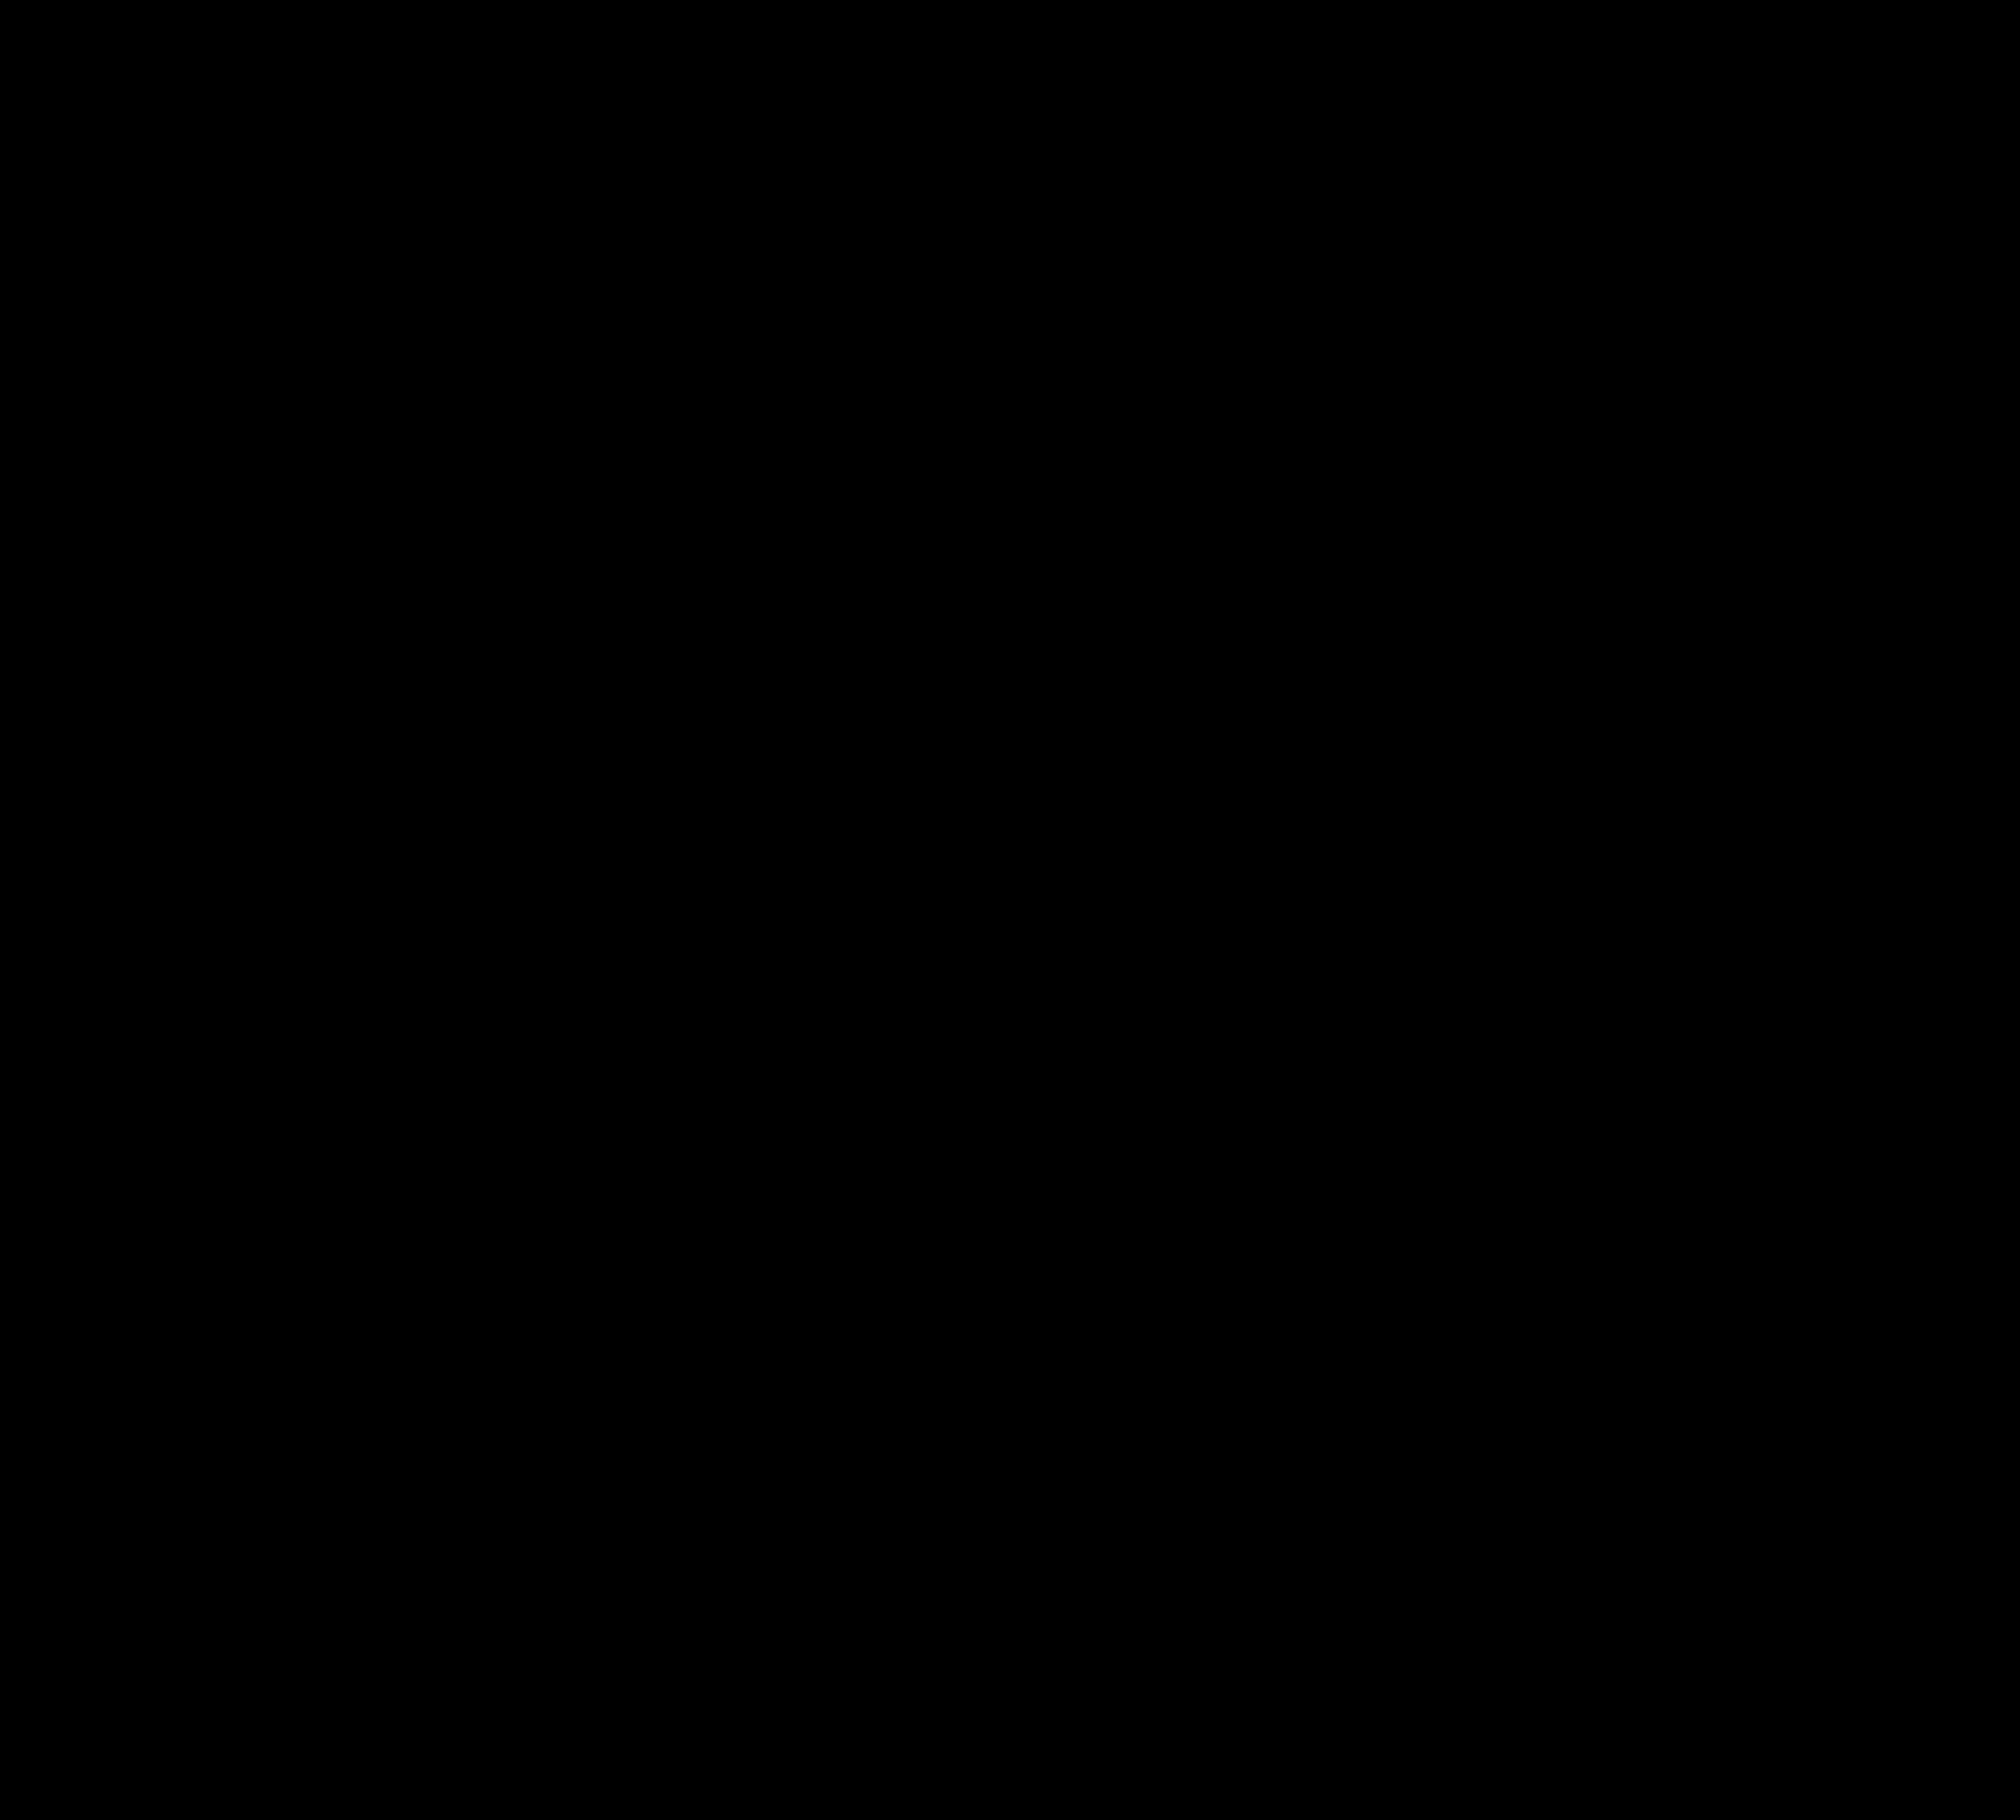 2394x2161 Clipart